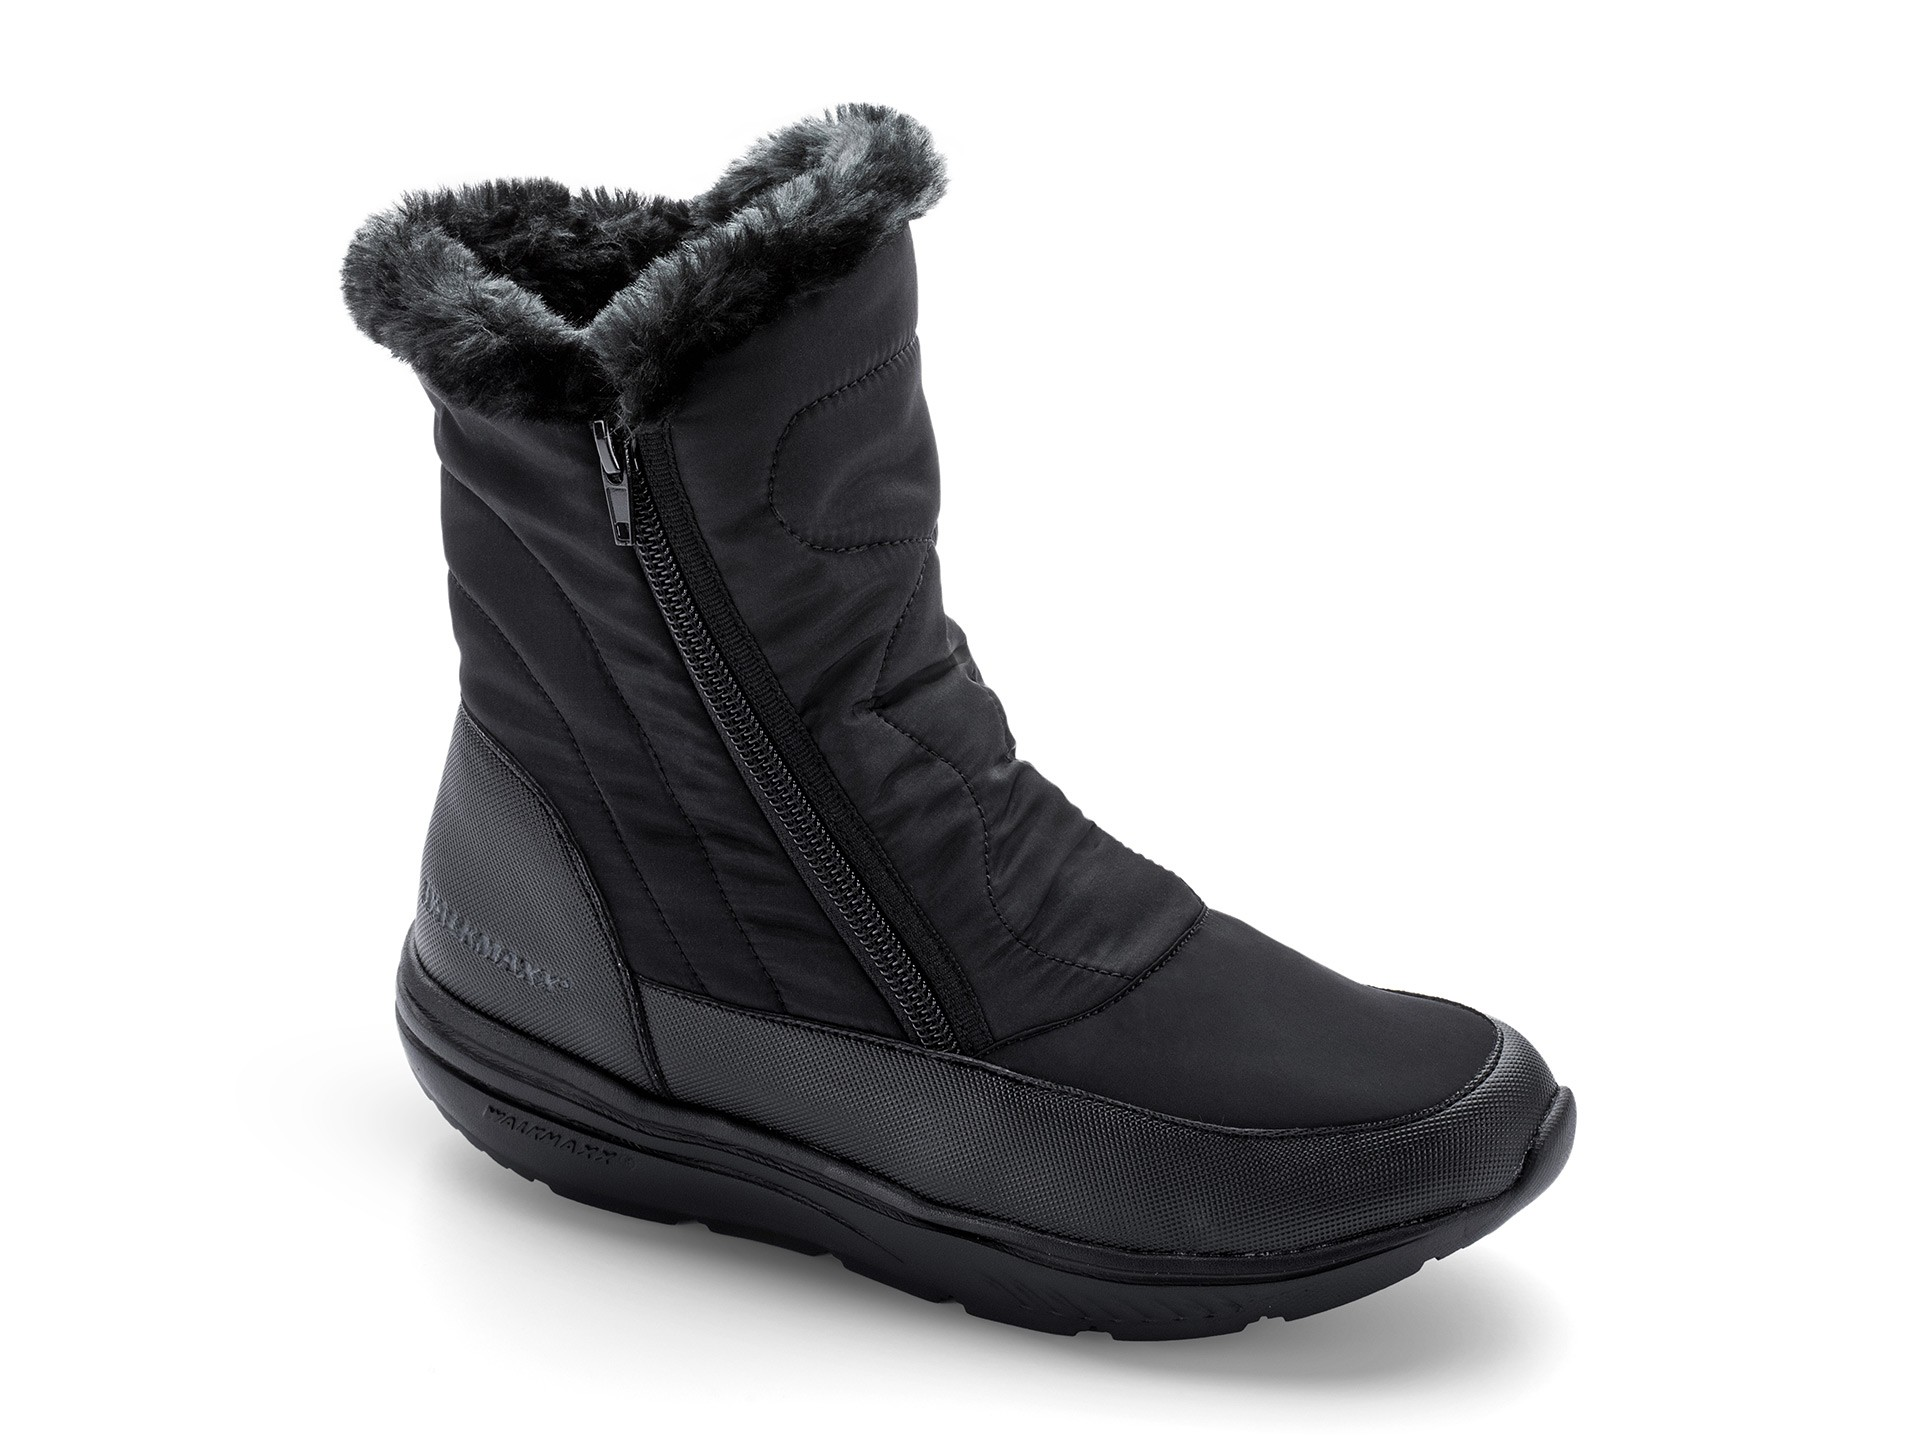 Comfort Winter Boots Women Low 2.0 4f5c0e49d4d17